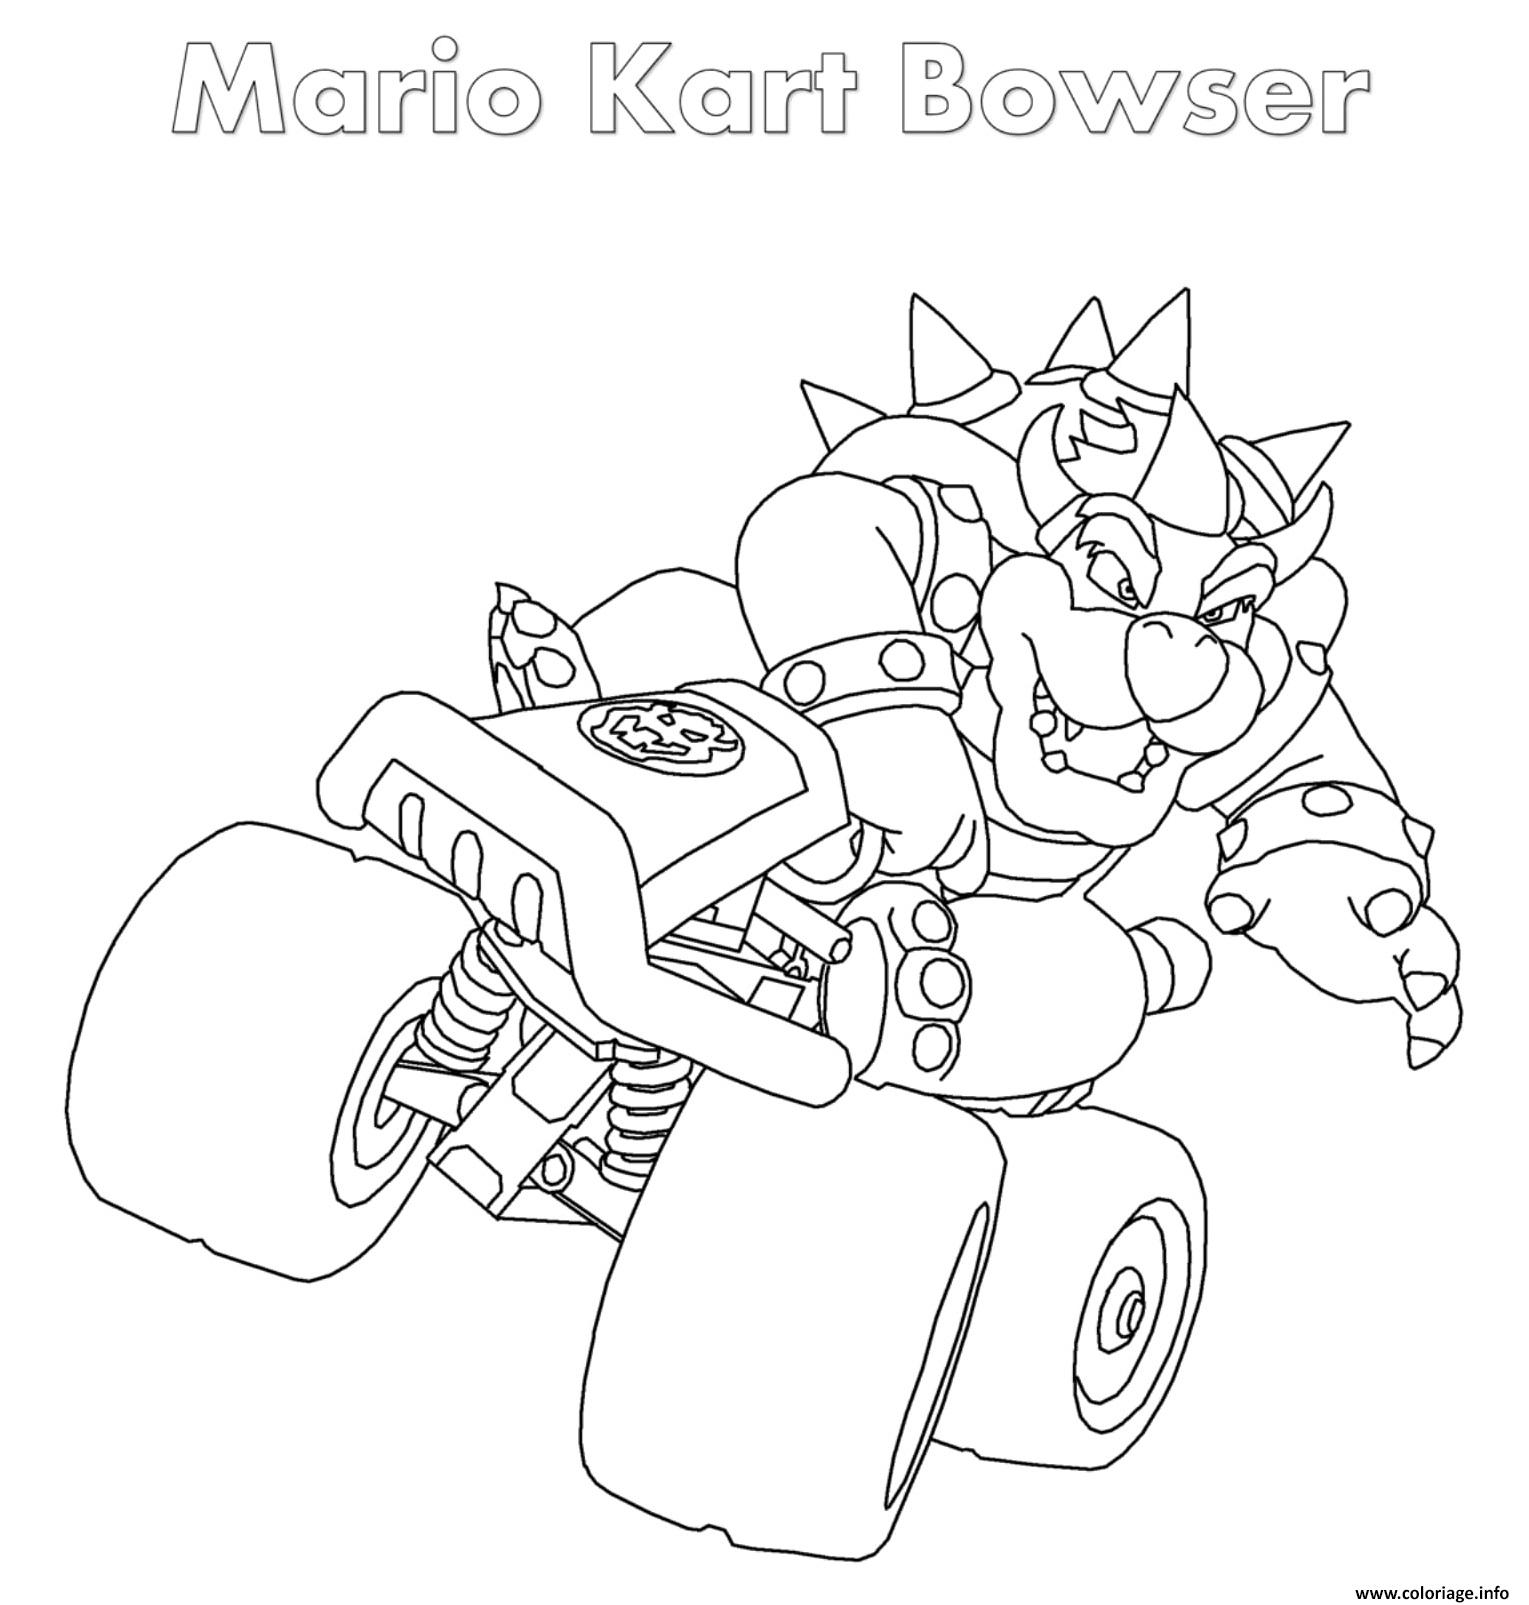 Coloriage Bowser Mario Kart Nintendo dessin